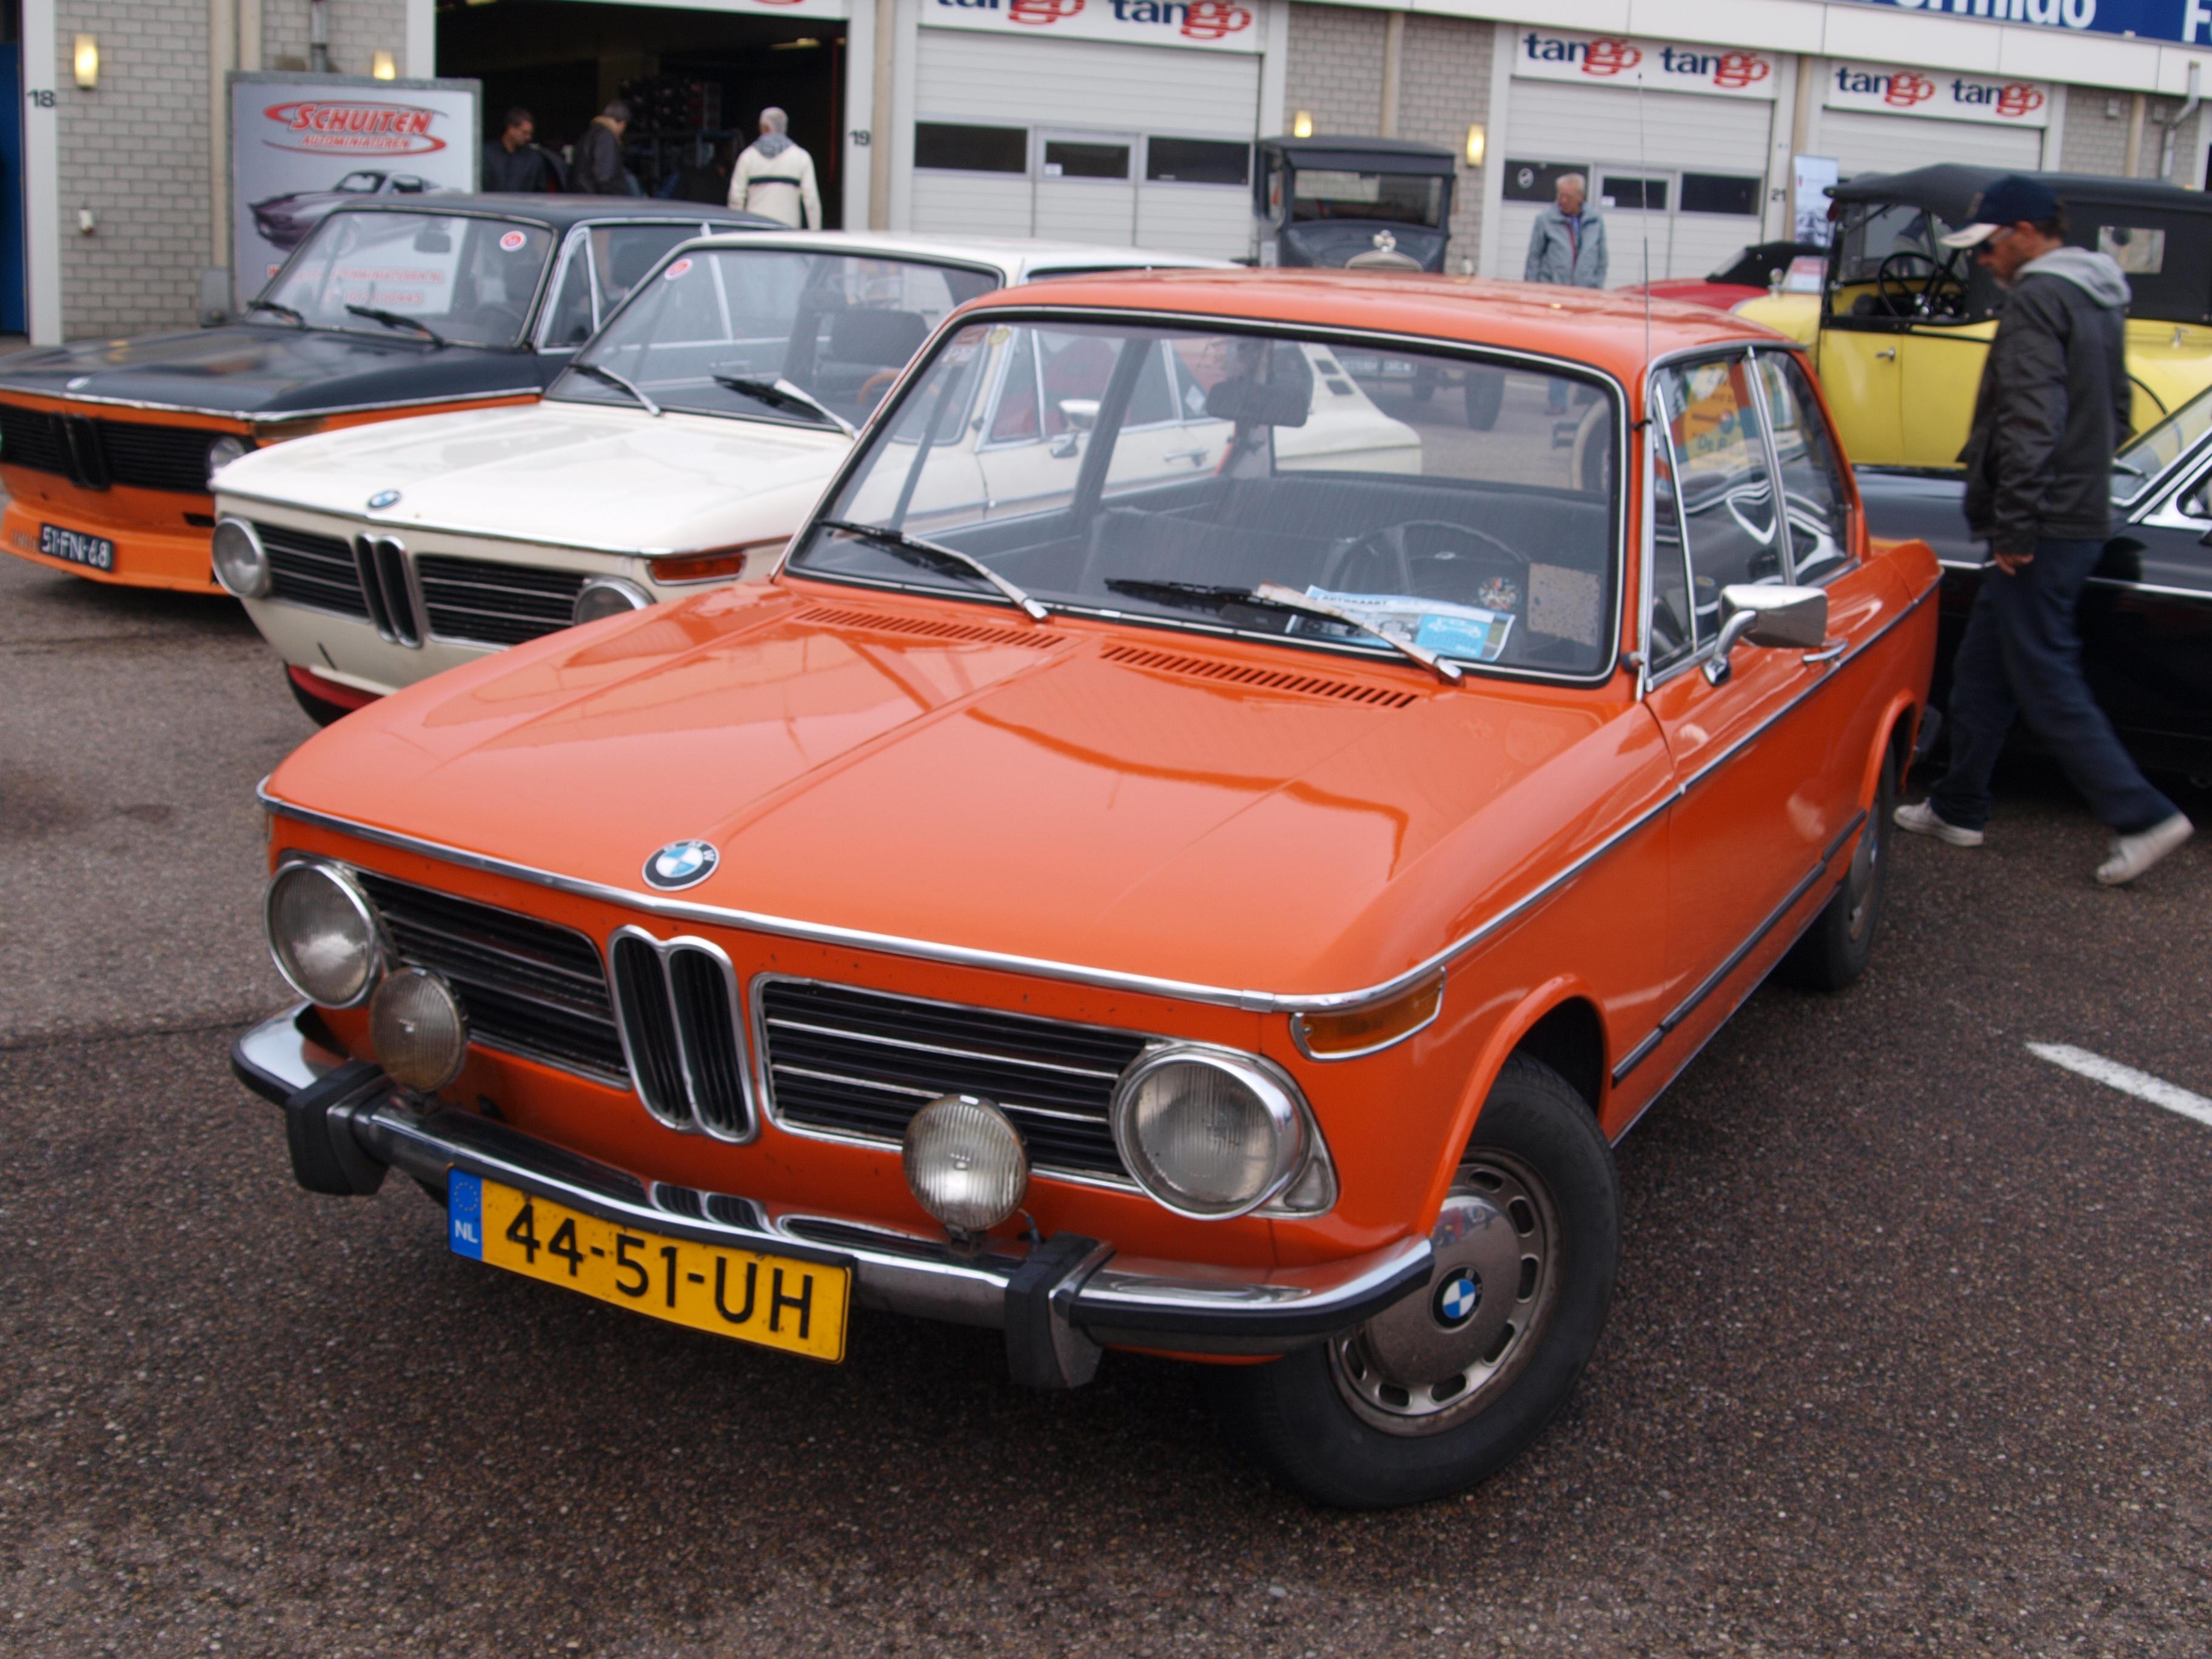 File:Nationale oldtimerdag Zandvoort 2010, 1973 BMW 2002, 44-51-UH.JPG